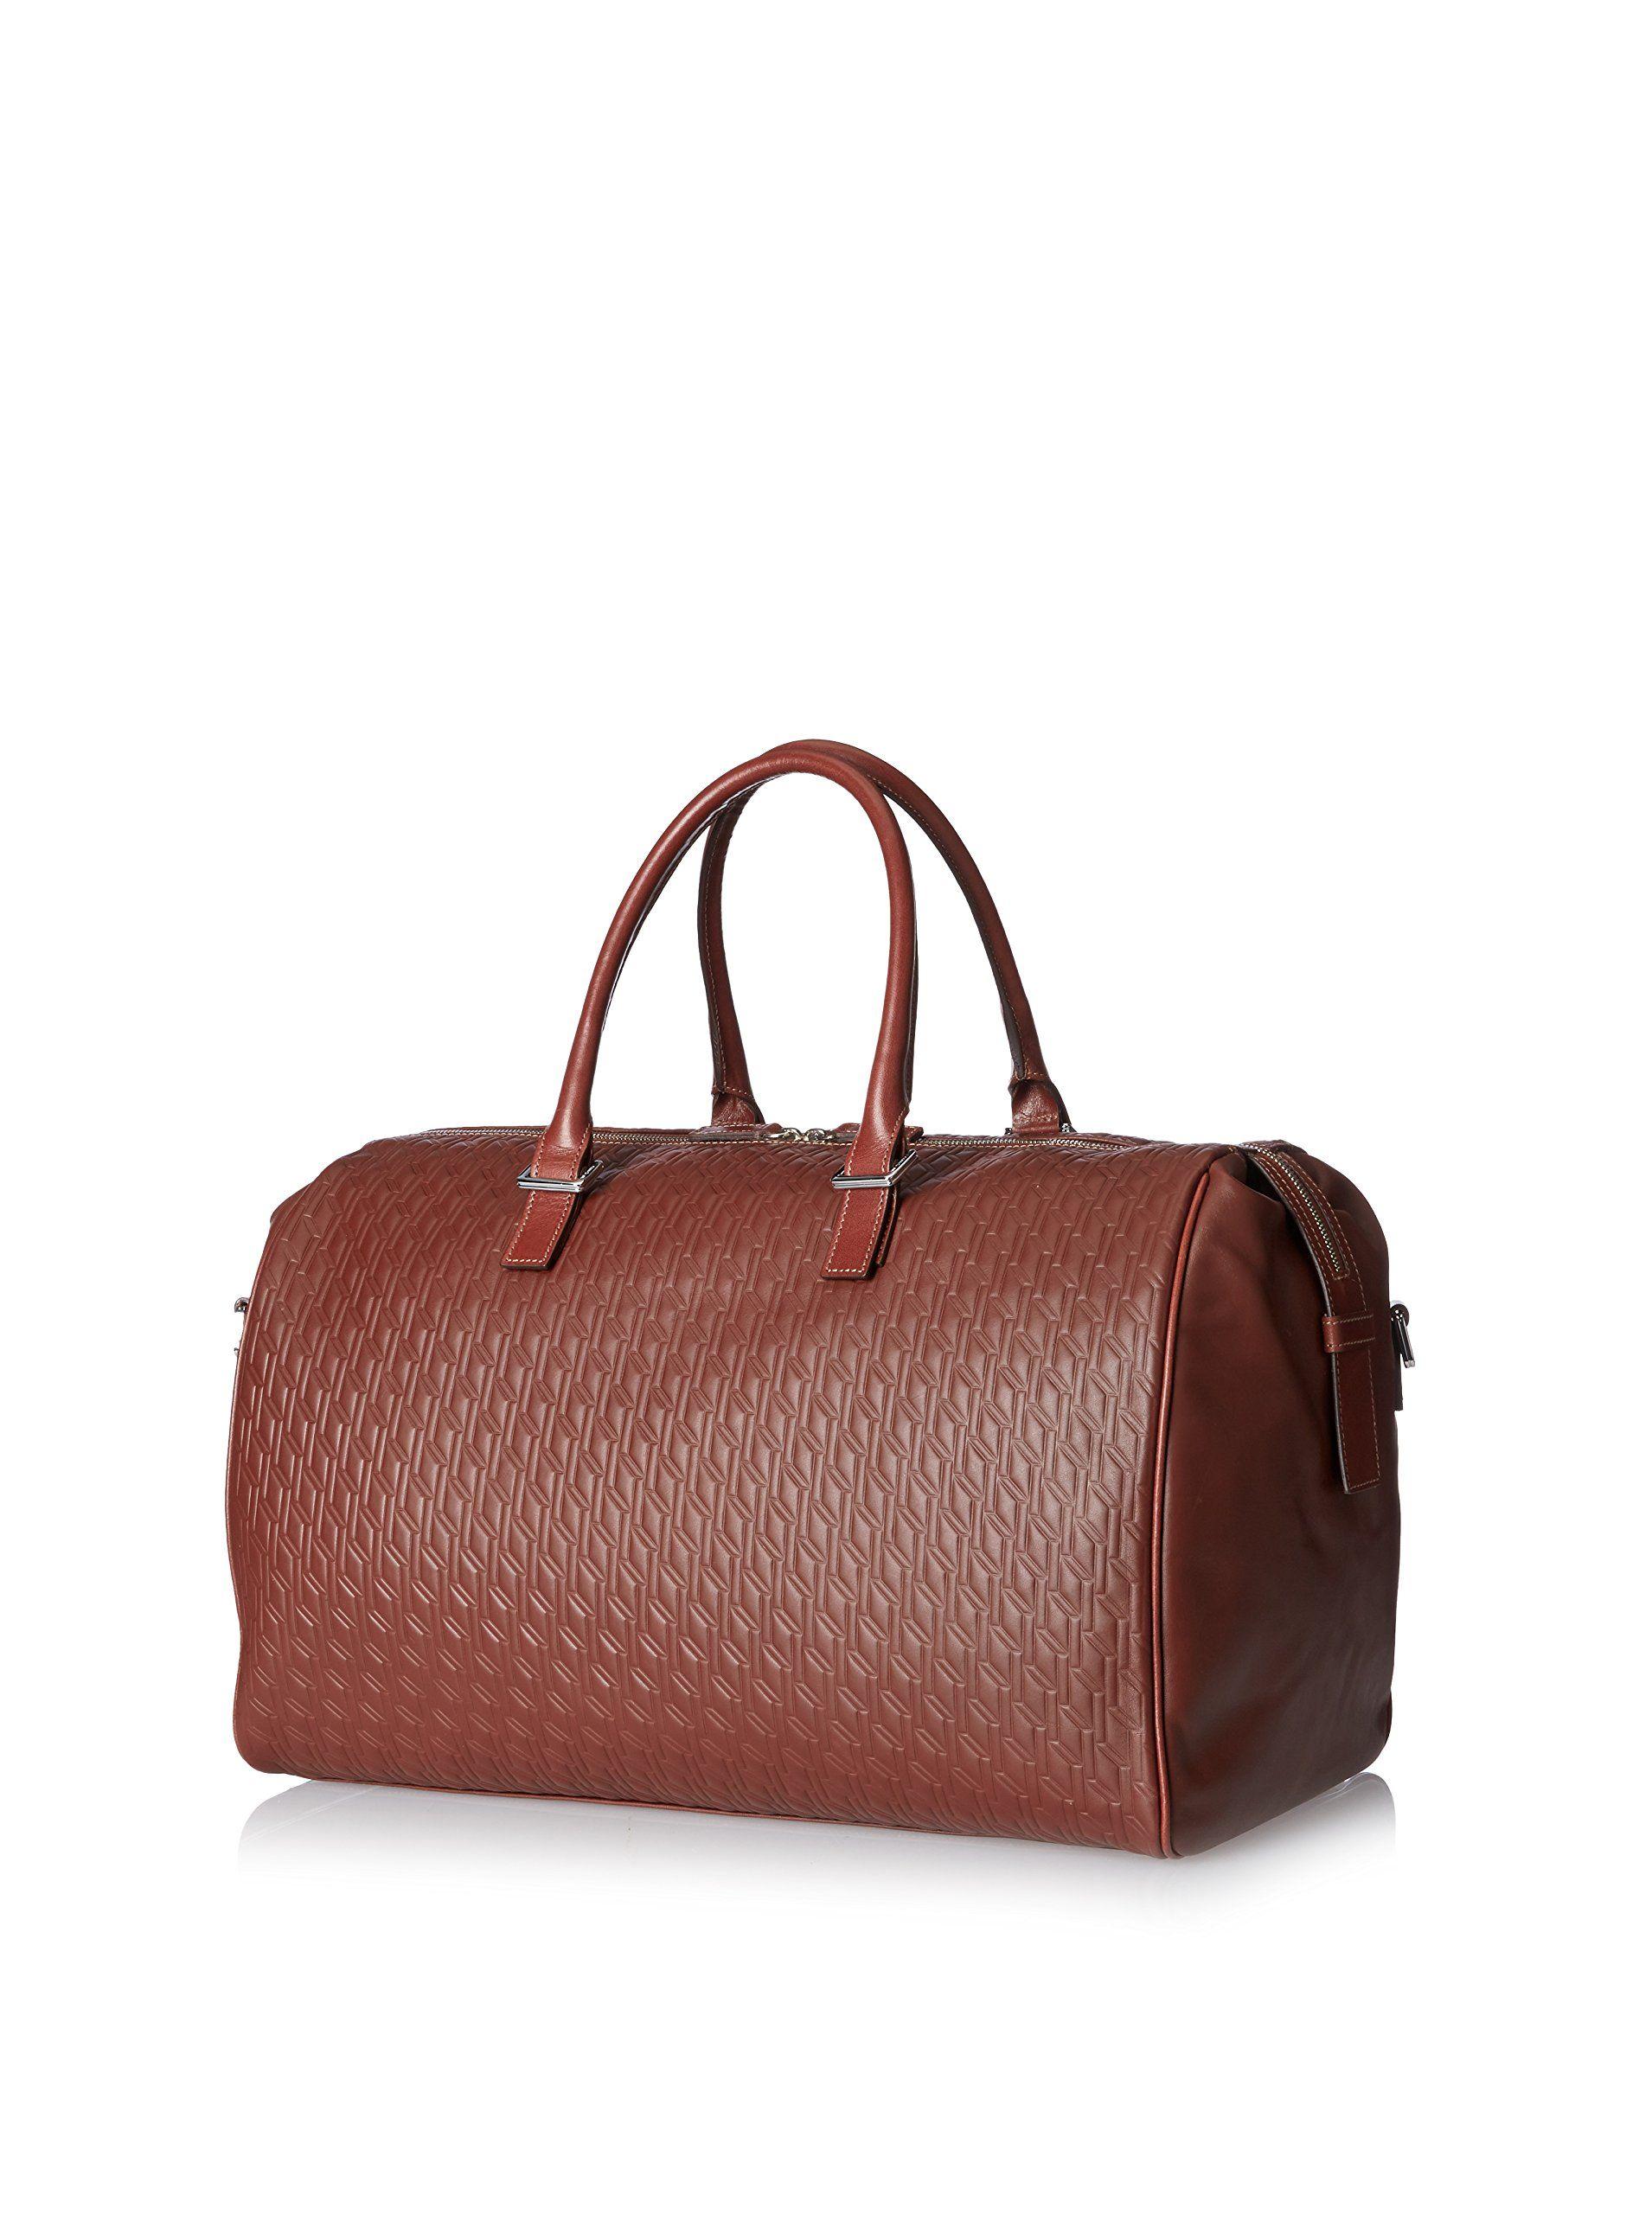 4c289e3638 Cerruti 1881 Men's Borsone Mustique Bag, Marro at MYHABIT | Dress to ...